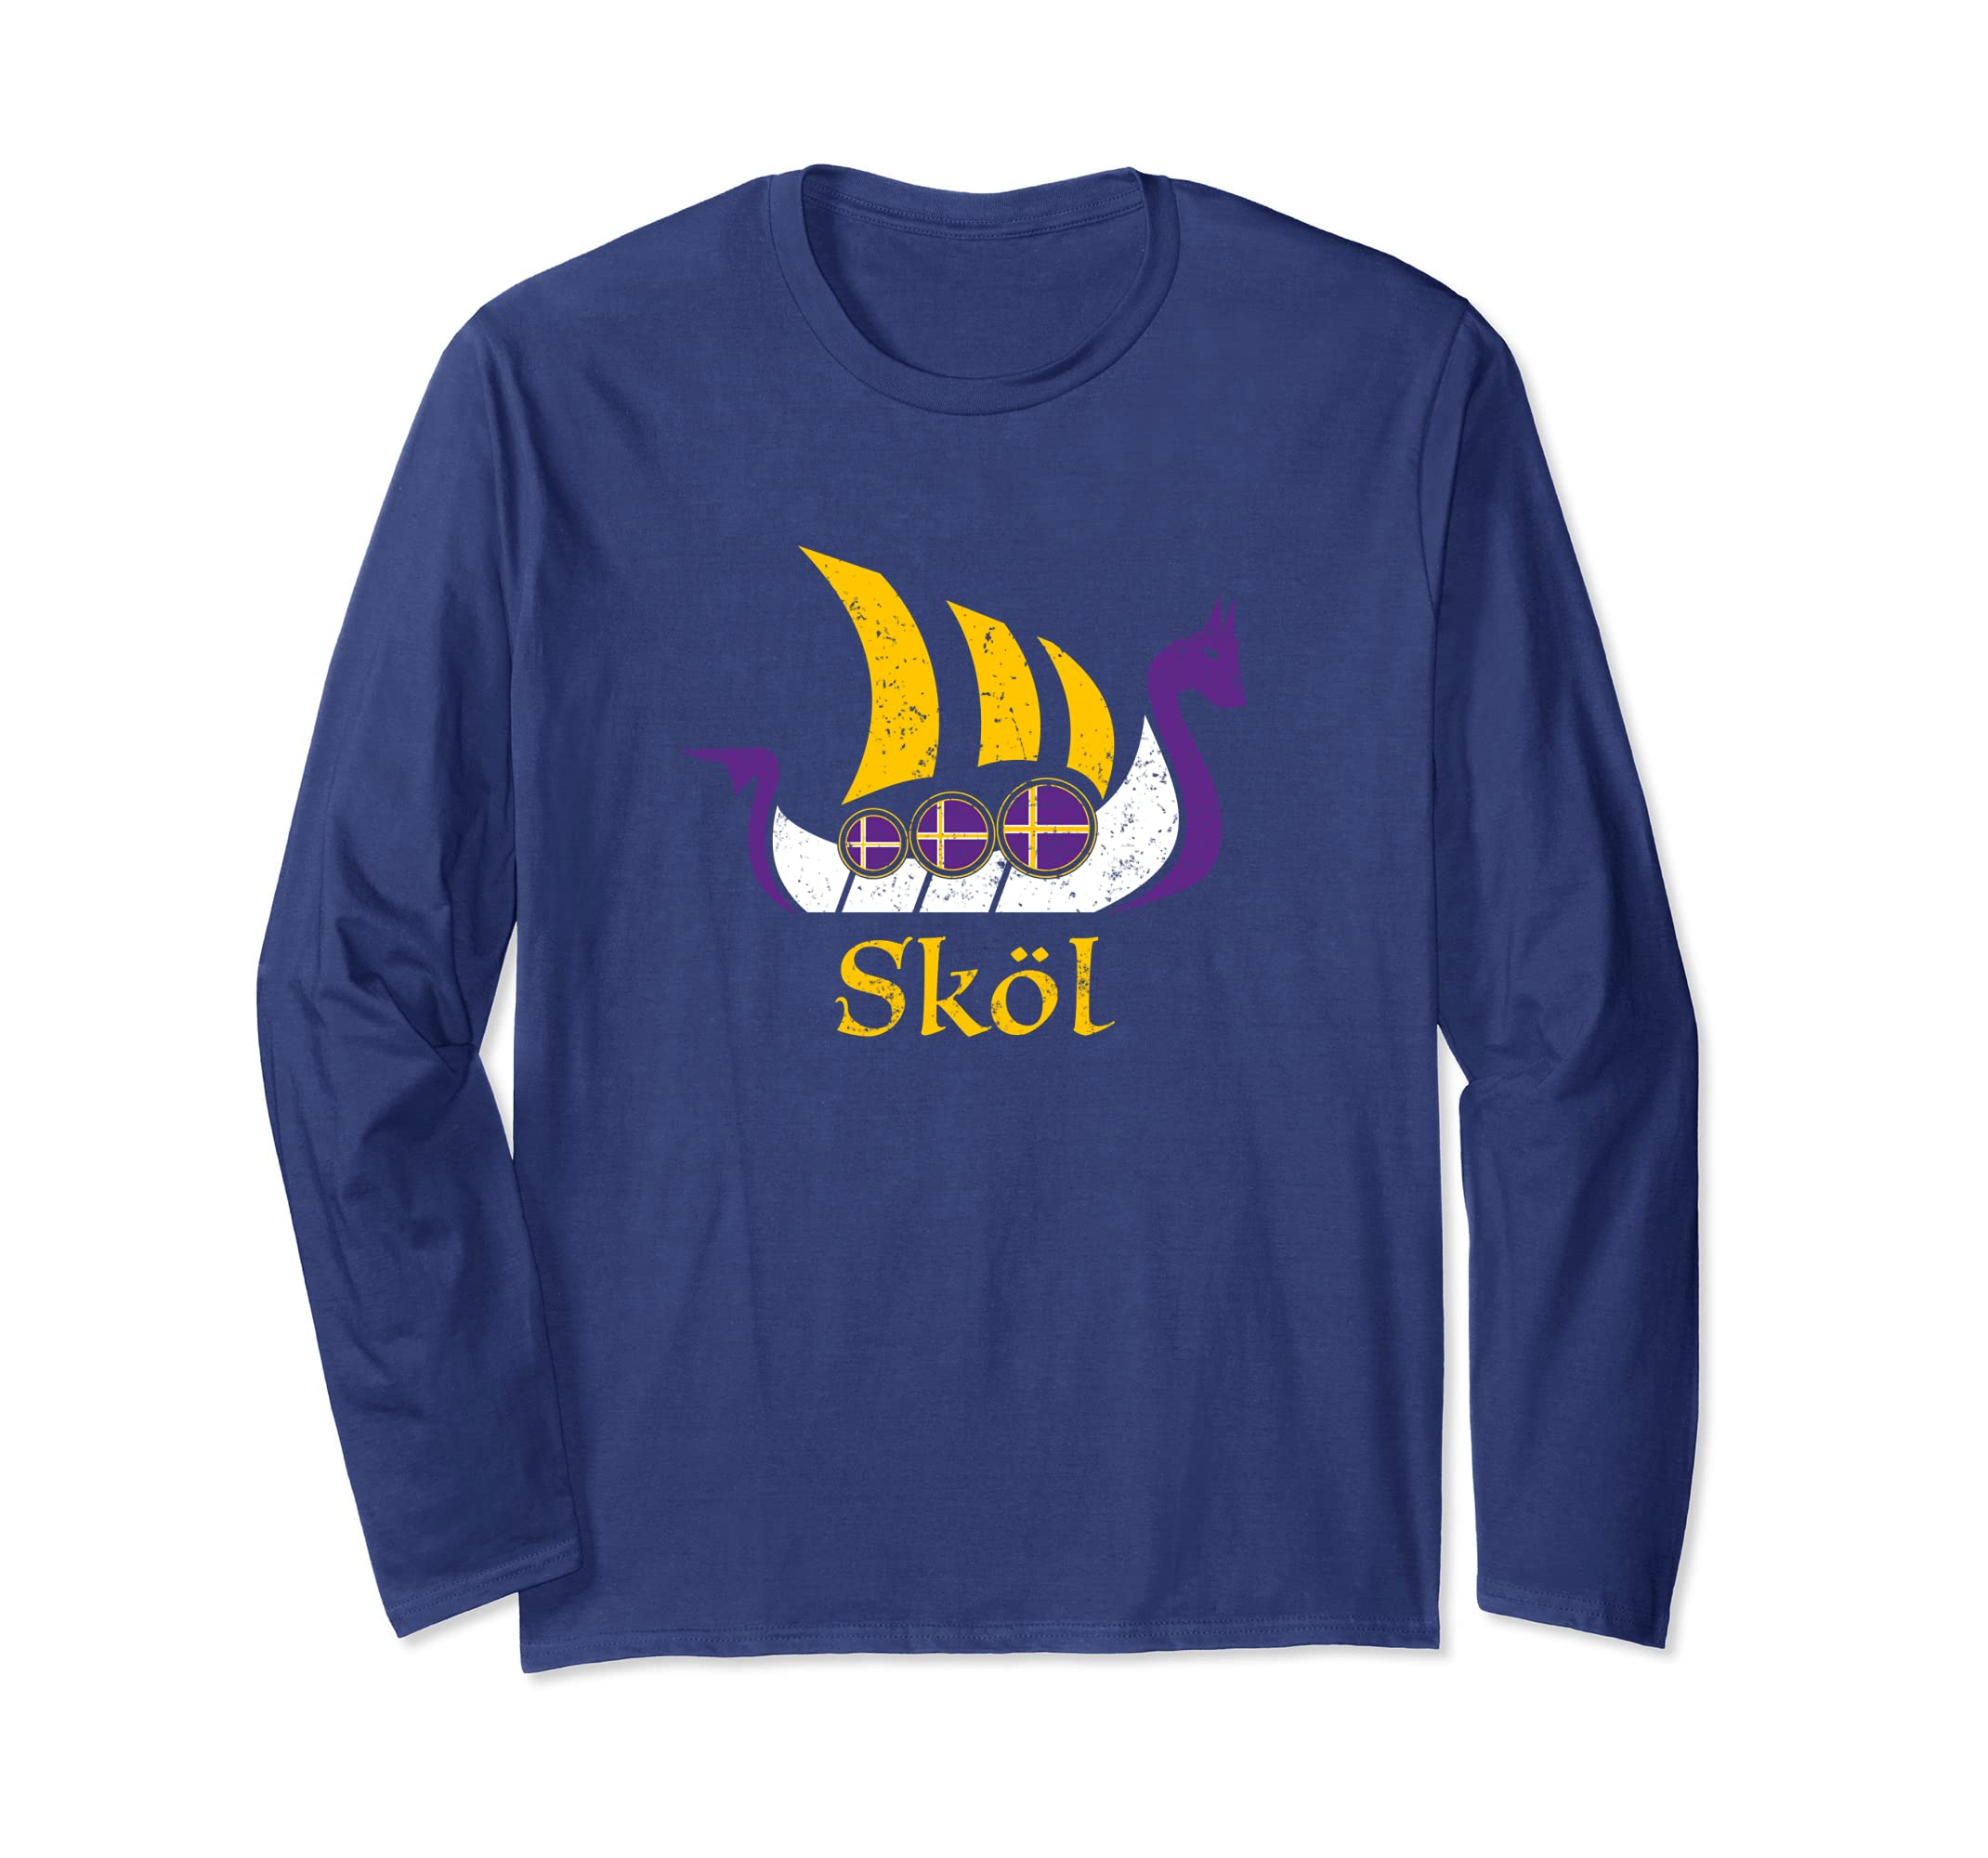 Skol Long Sleeve Shirt Nordic Scandinavian Vikings Boat-Teechatpro